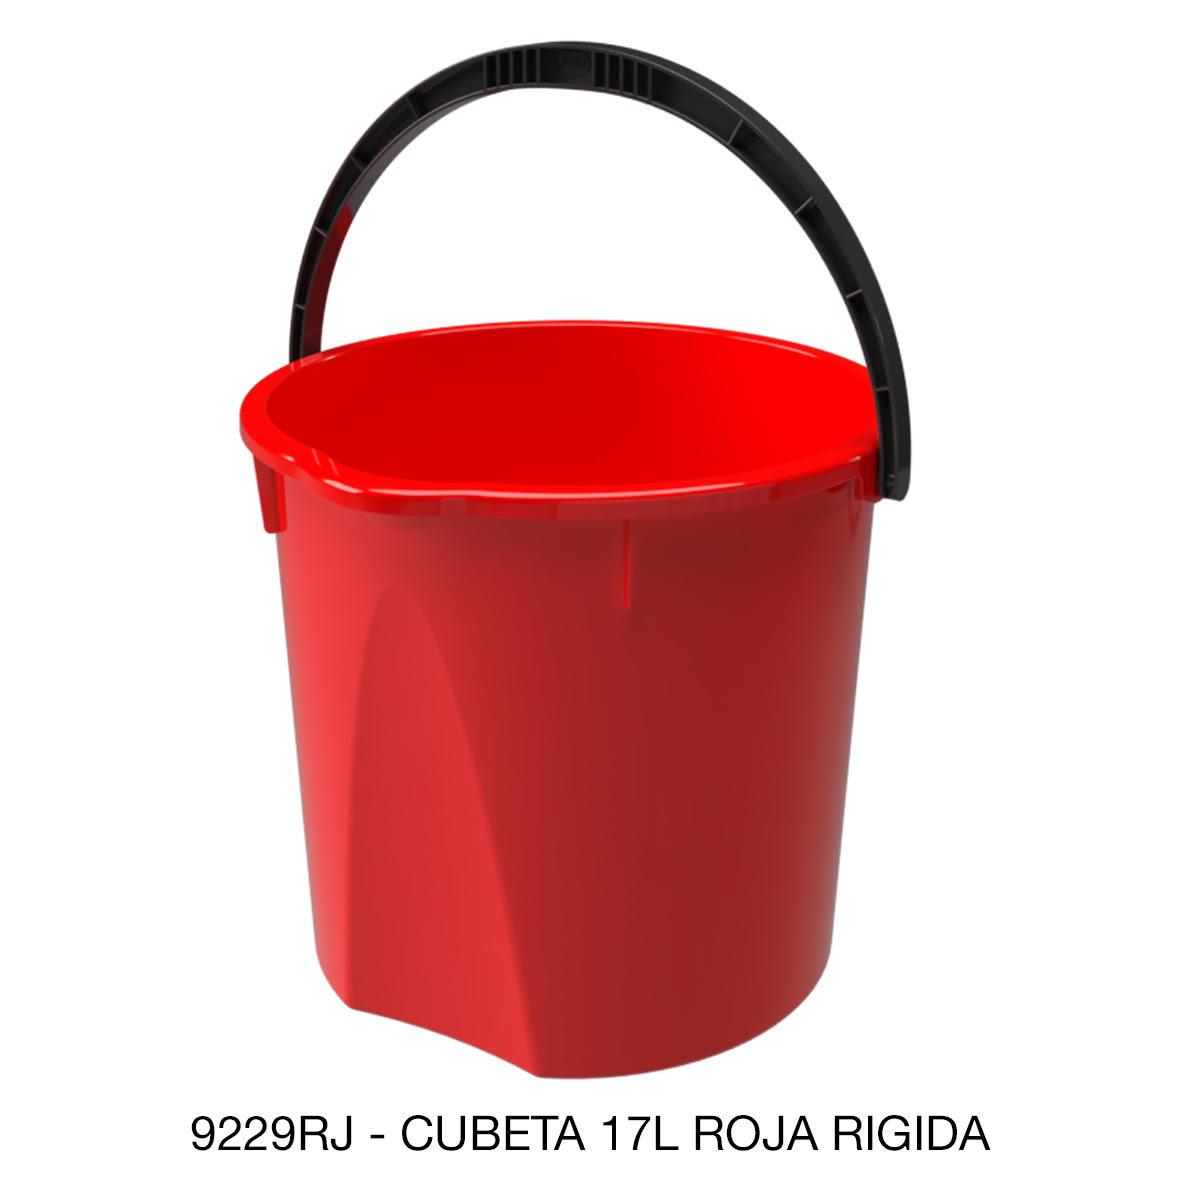 Cubeta resistente de 17 litros rígida color rojo modelo 9229RJ de Sablón